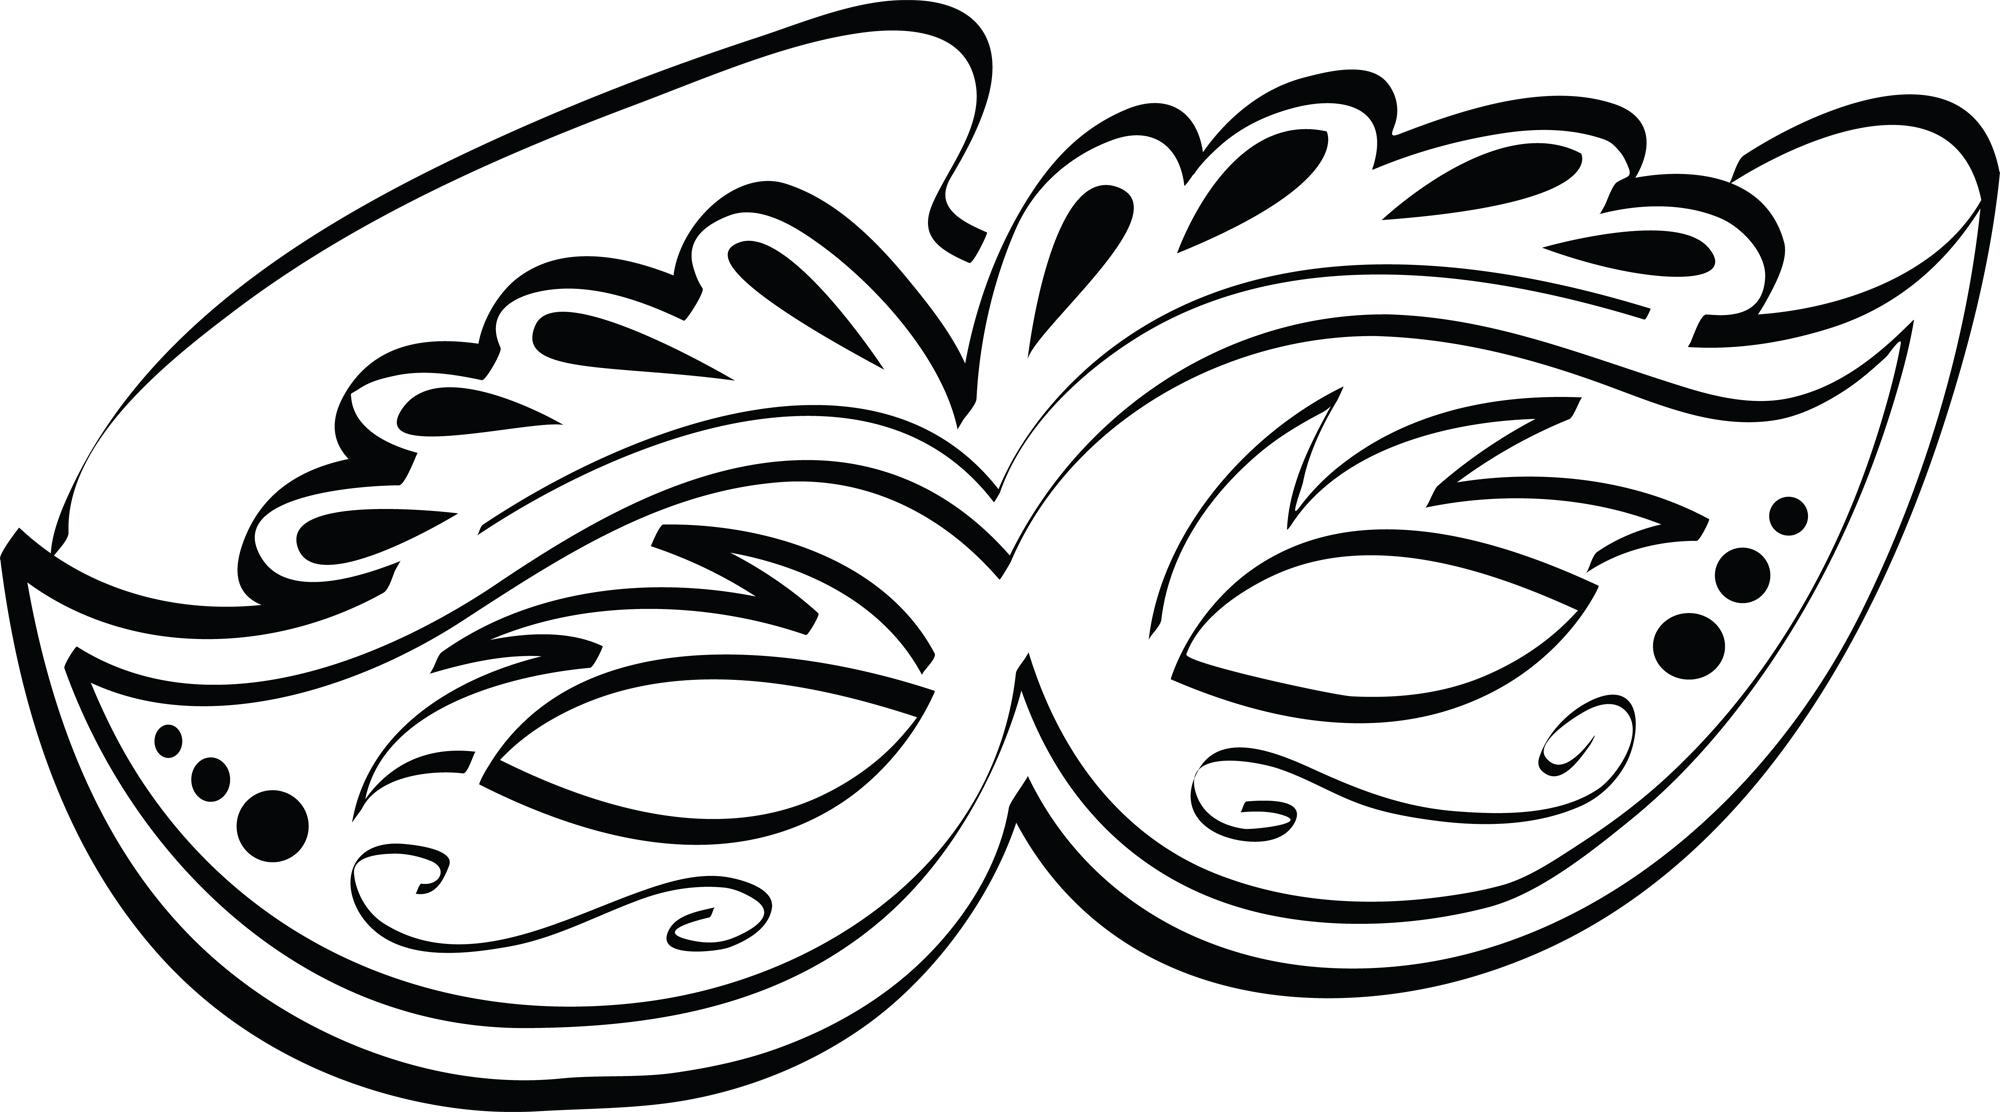 Mardi Gras Mask Carnival .-Mardi Gras Mask Carnival .-2